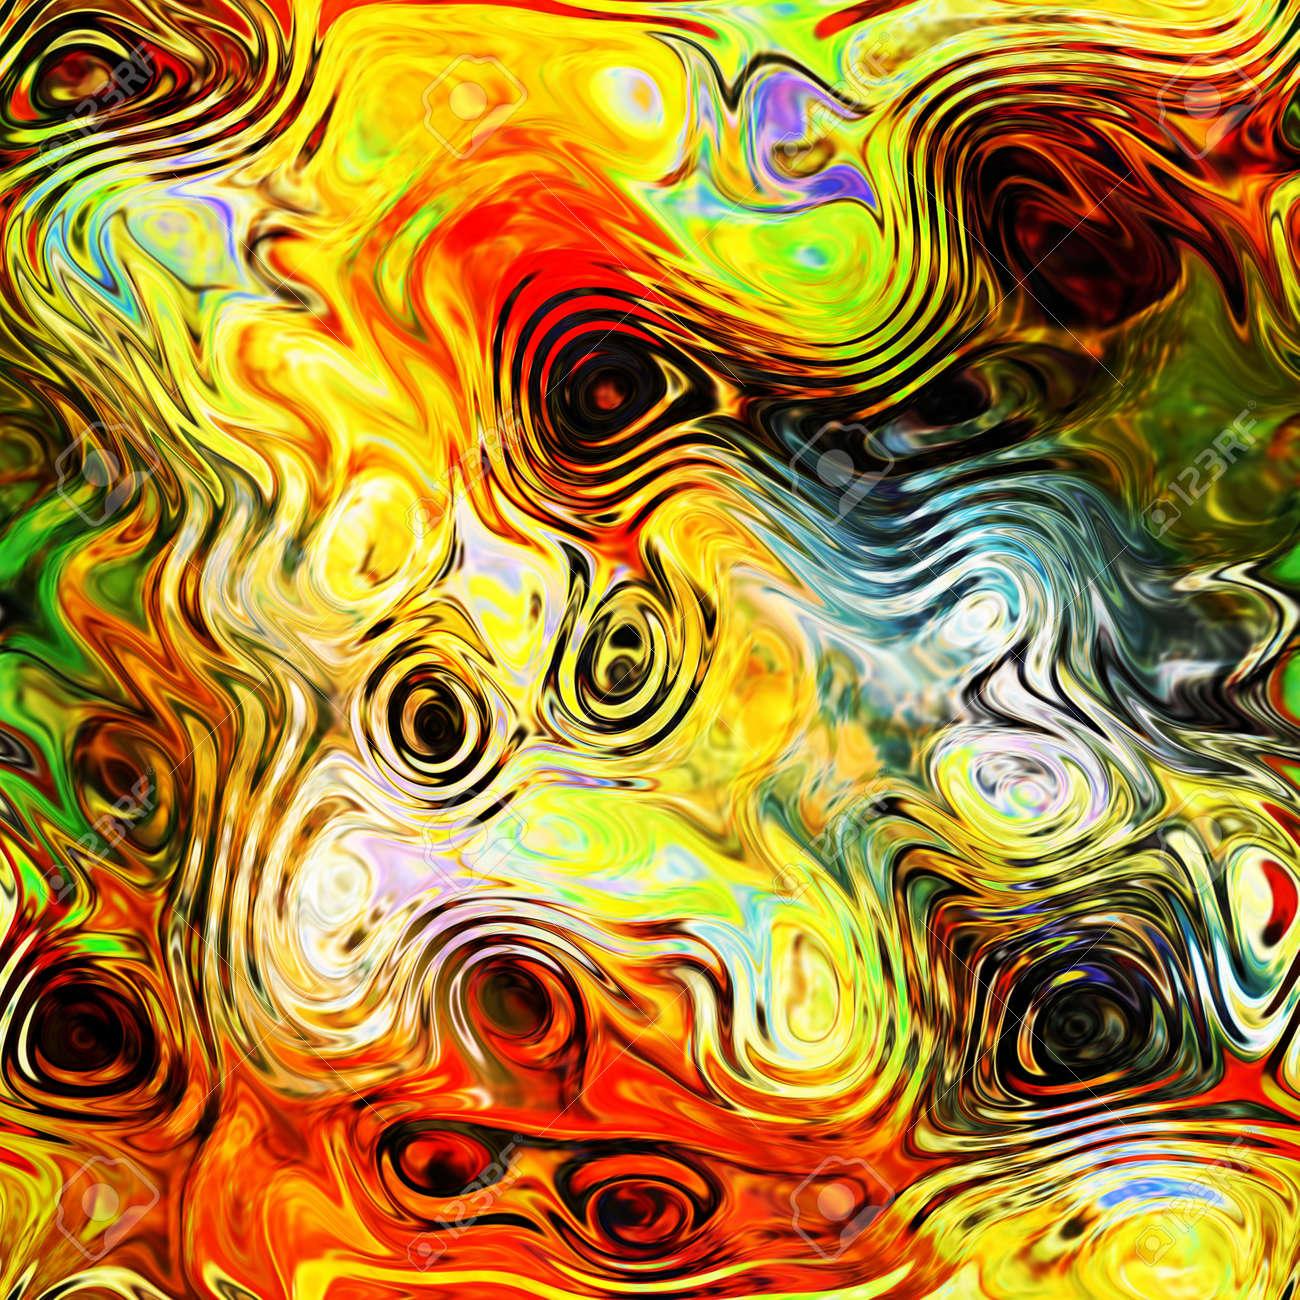 art abstract rainbow fractal pattern background Stock Photo - 17395370